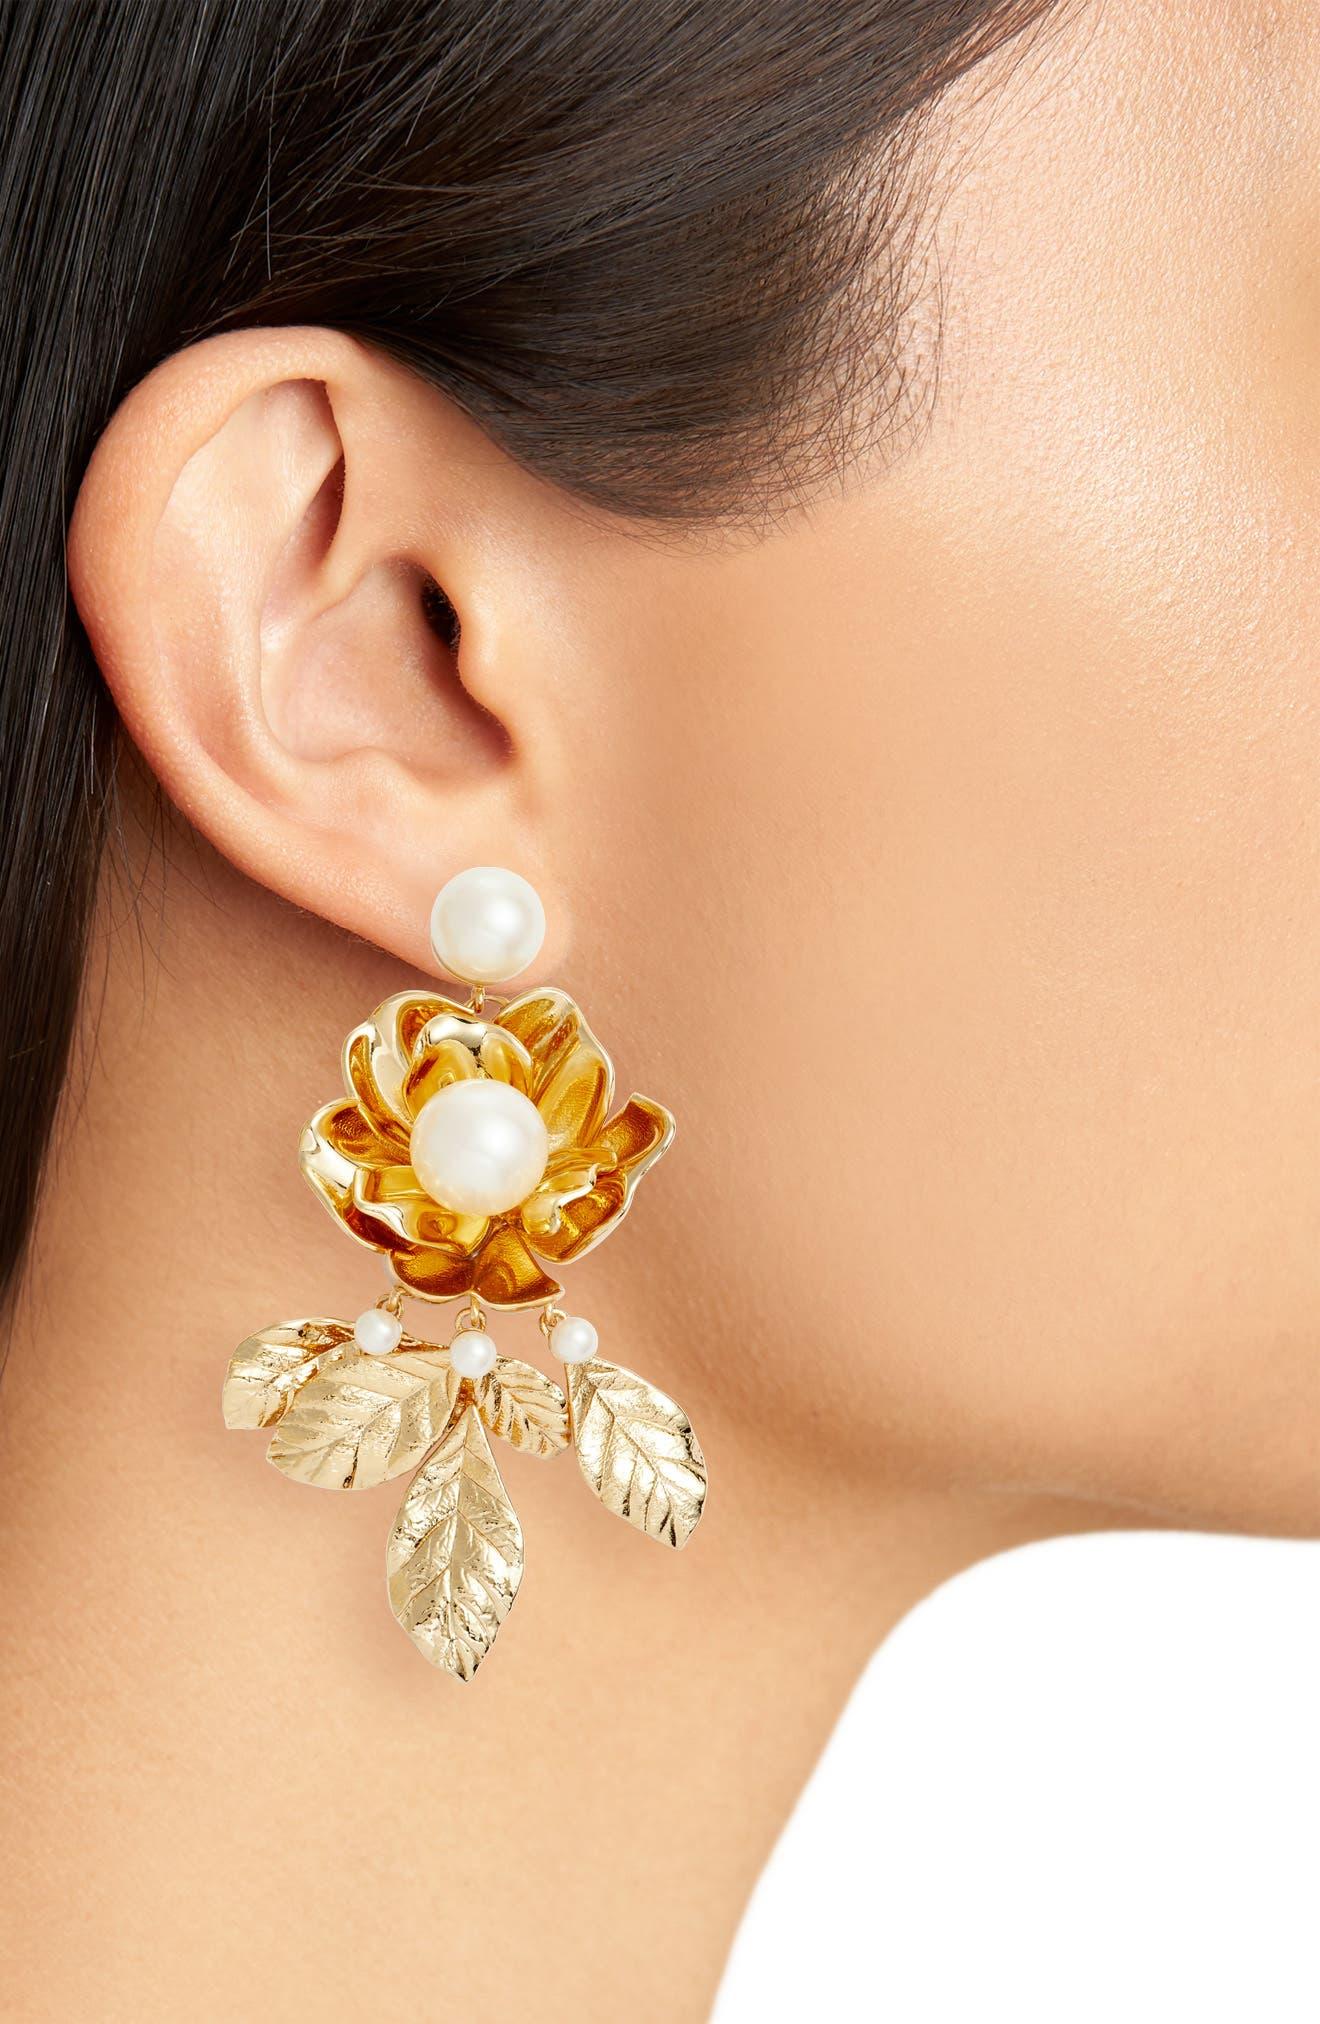 KATE SPADE NEW YORK,                             kate spade imitation pearl flower earrings,                             Alternate thumbnail 2, color,                             711